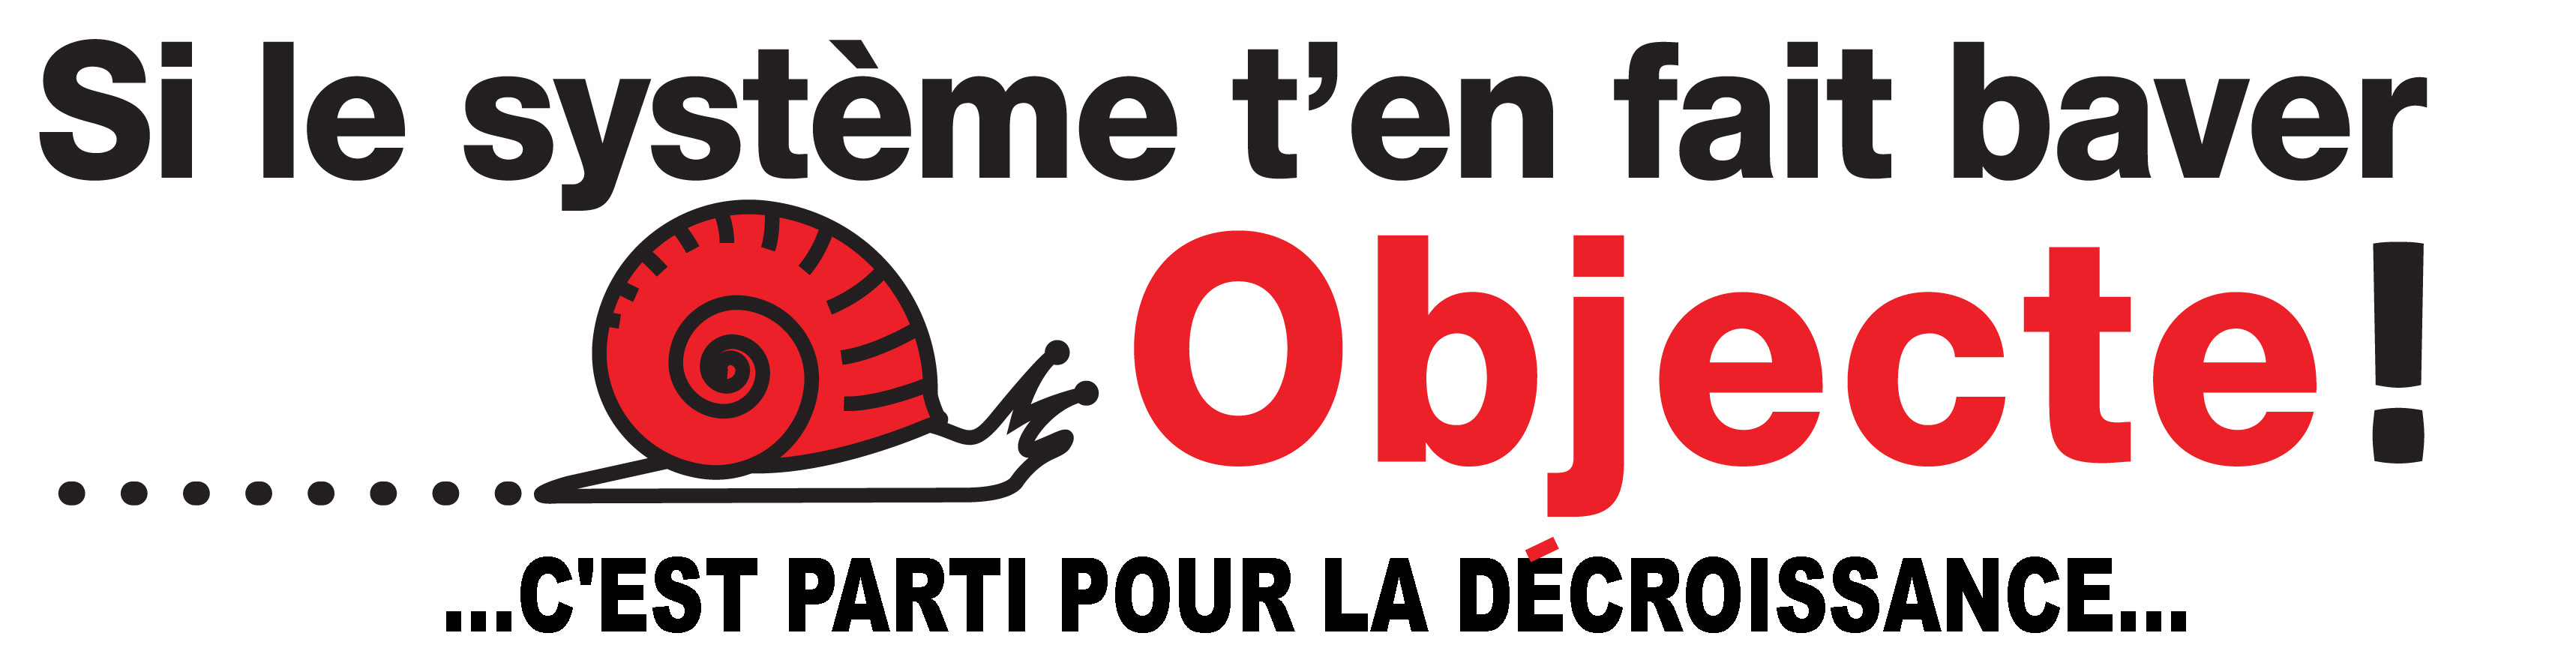 http://decroissance.lehavre.free.fr/images/banderolle-objecte.jpg